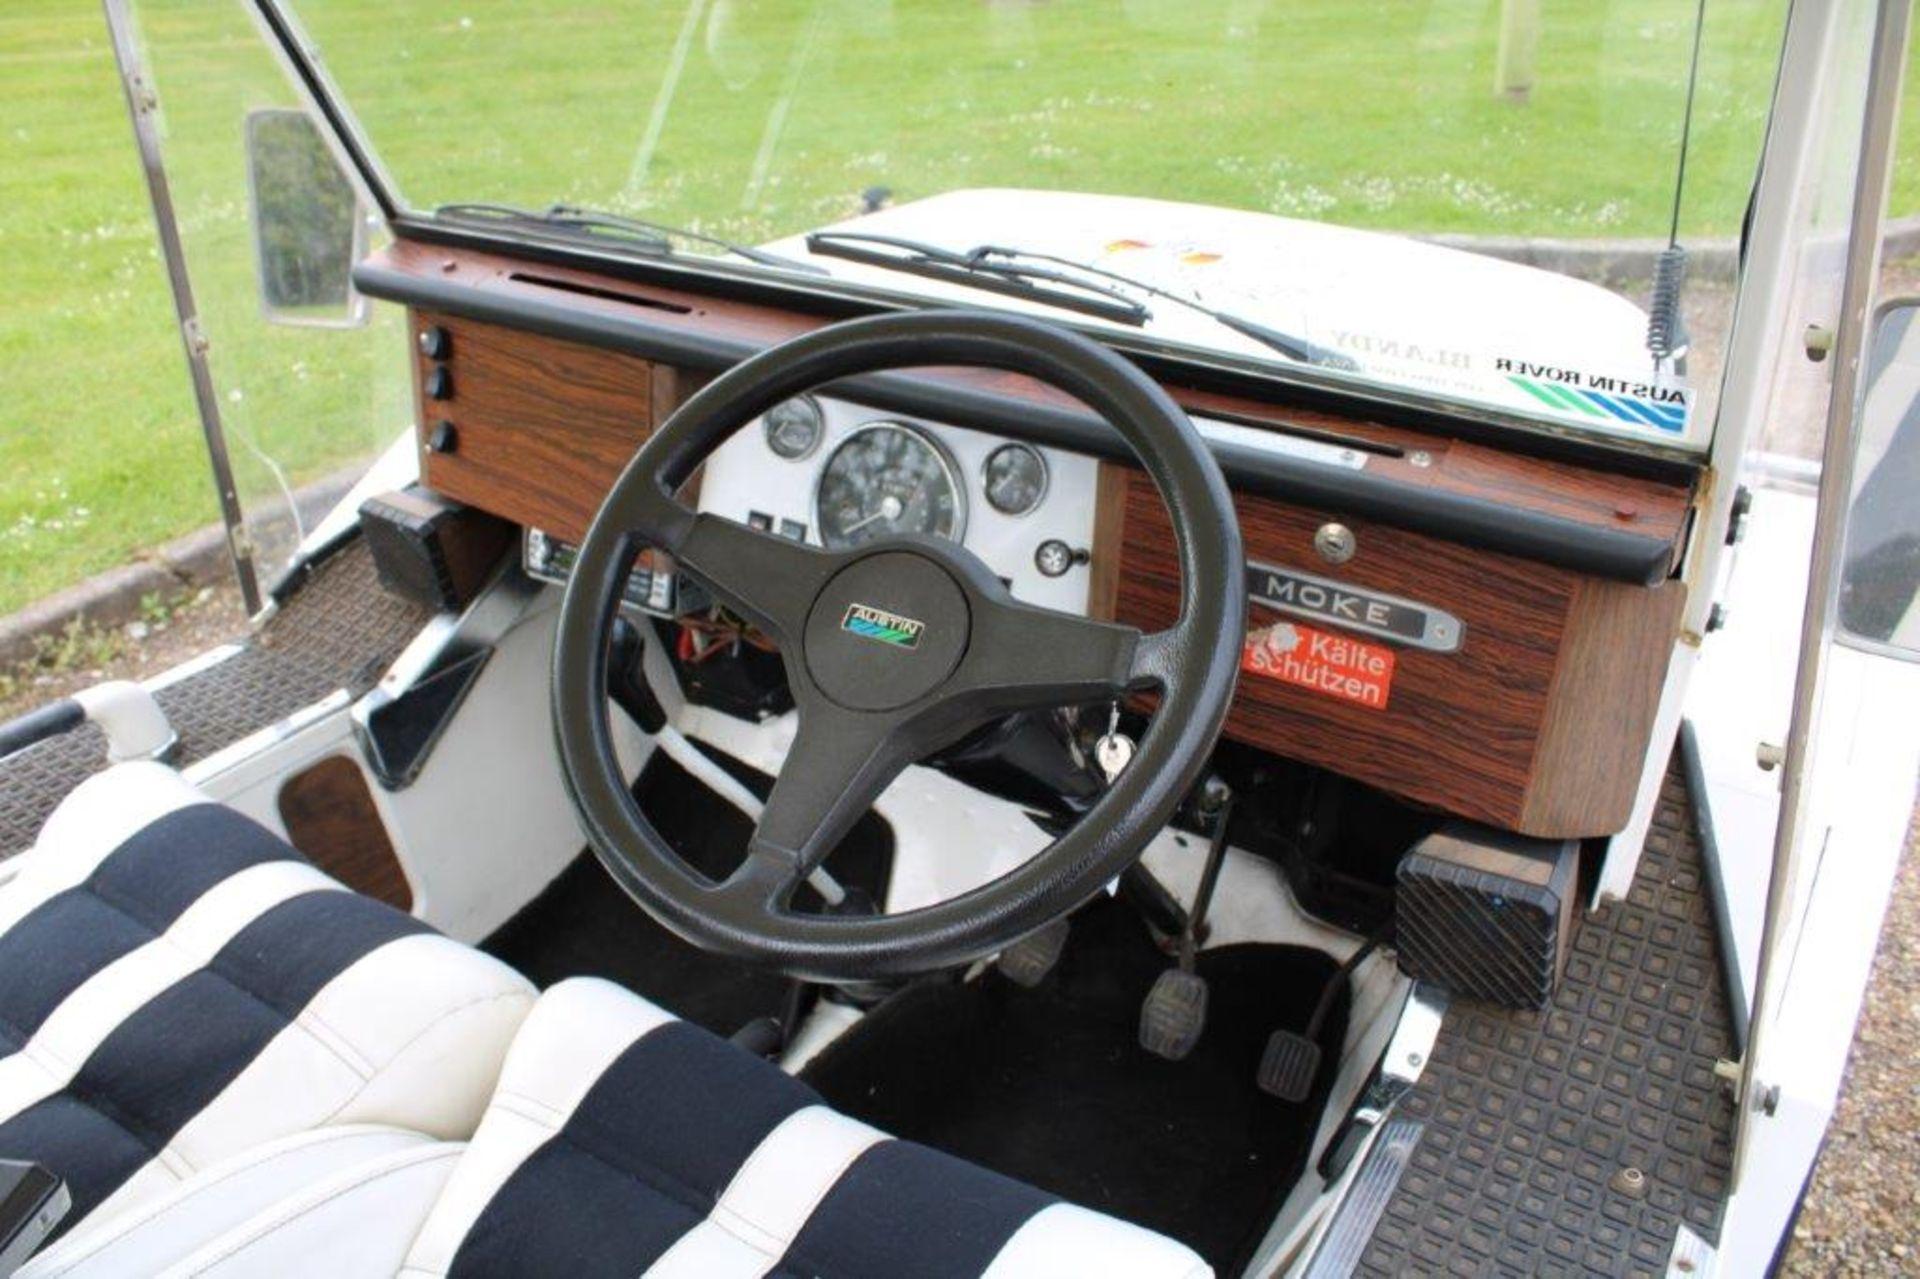 1988 Austin Rover Mini Moke - Image 18 of 22